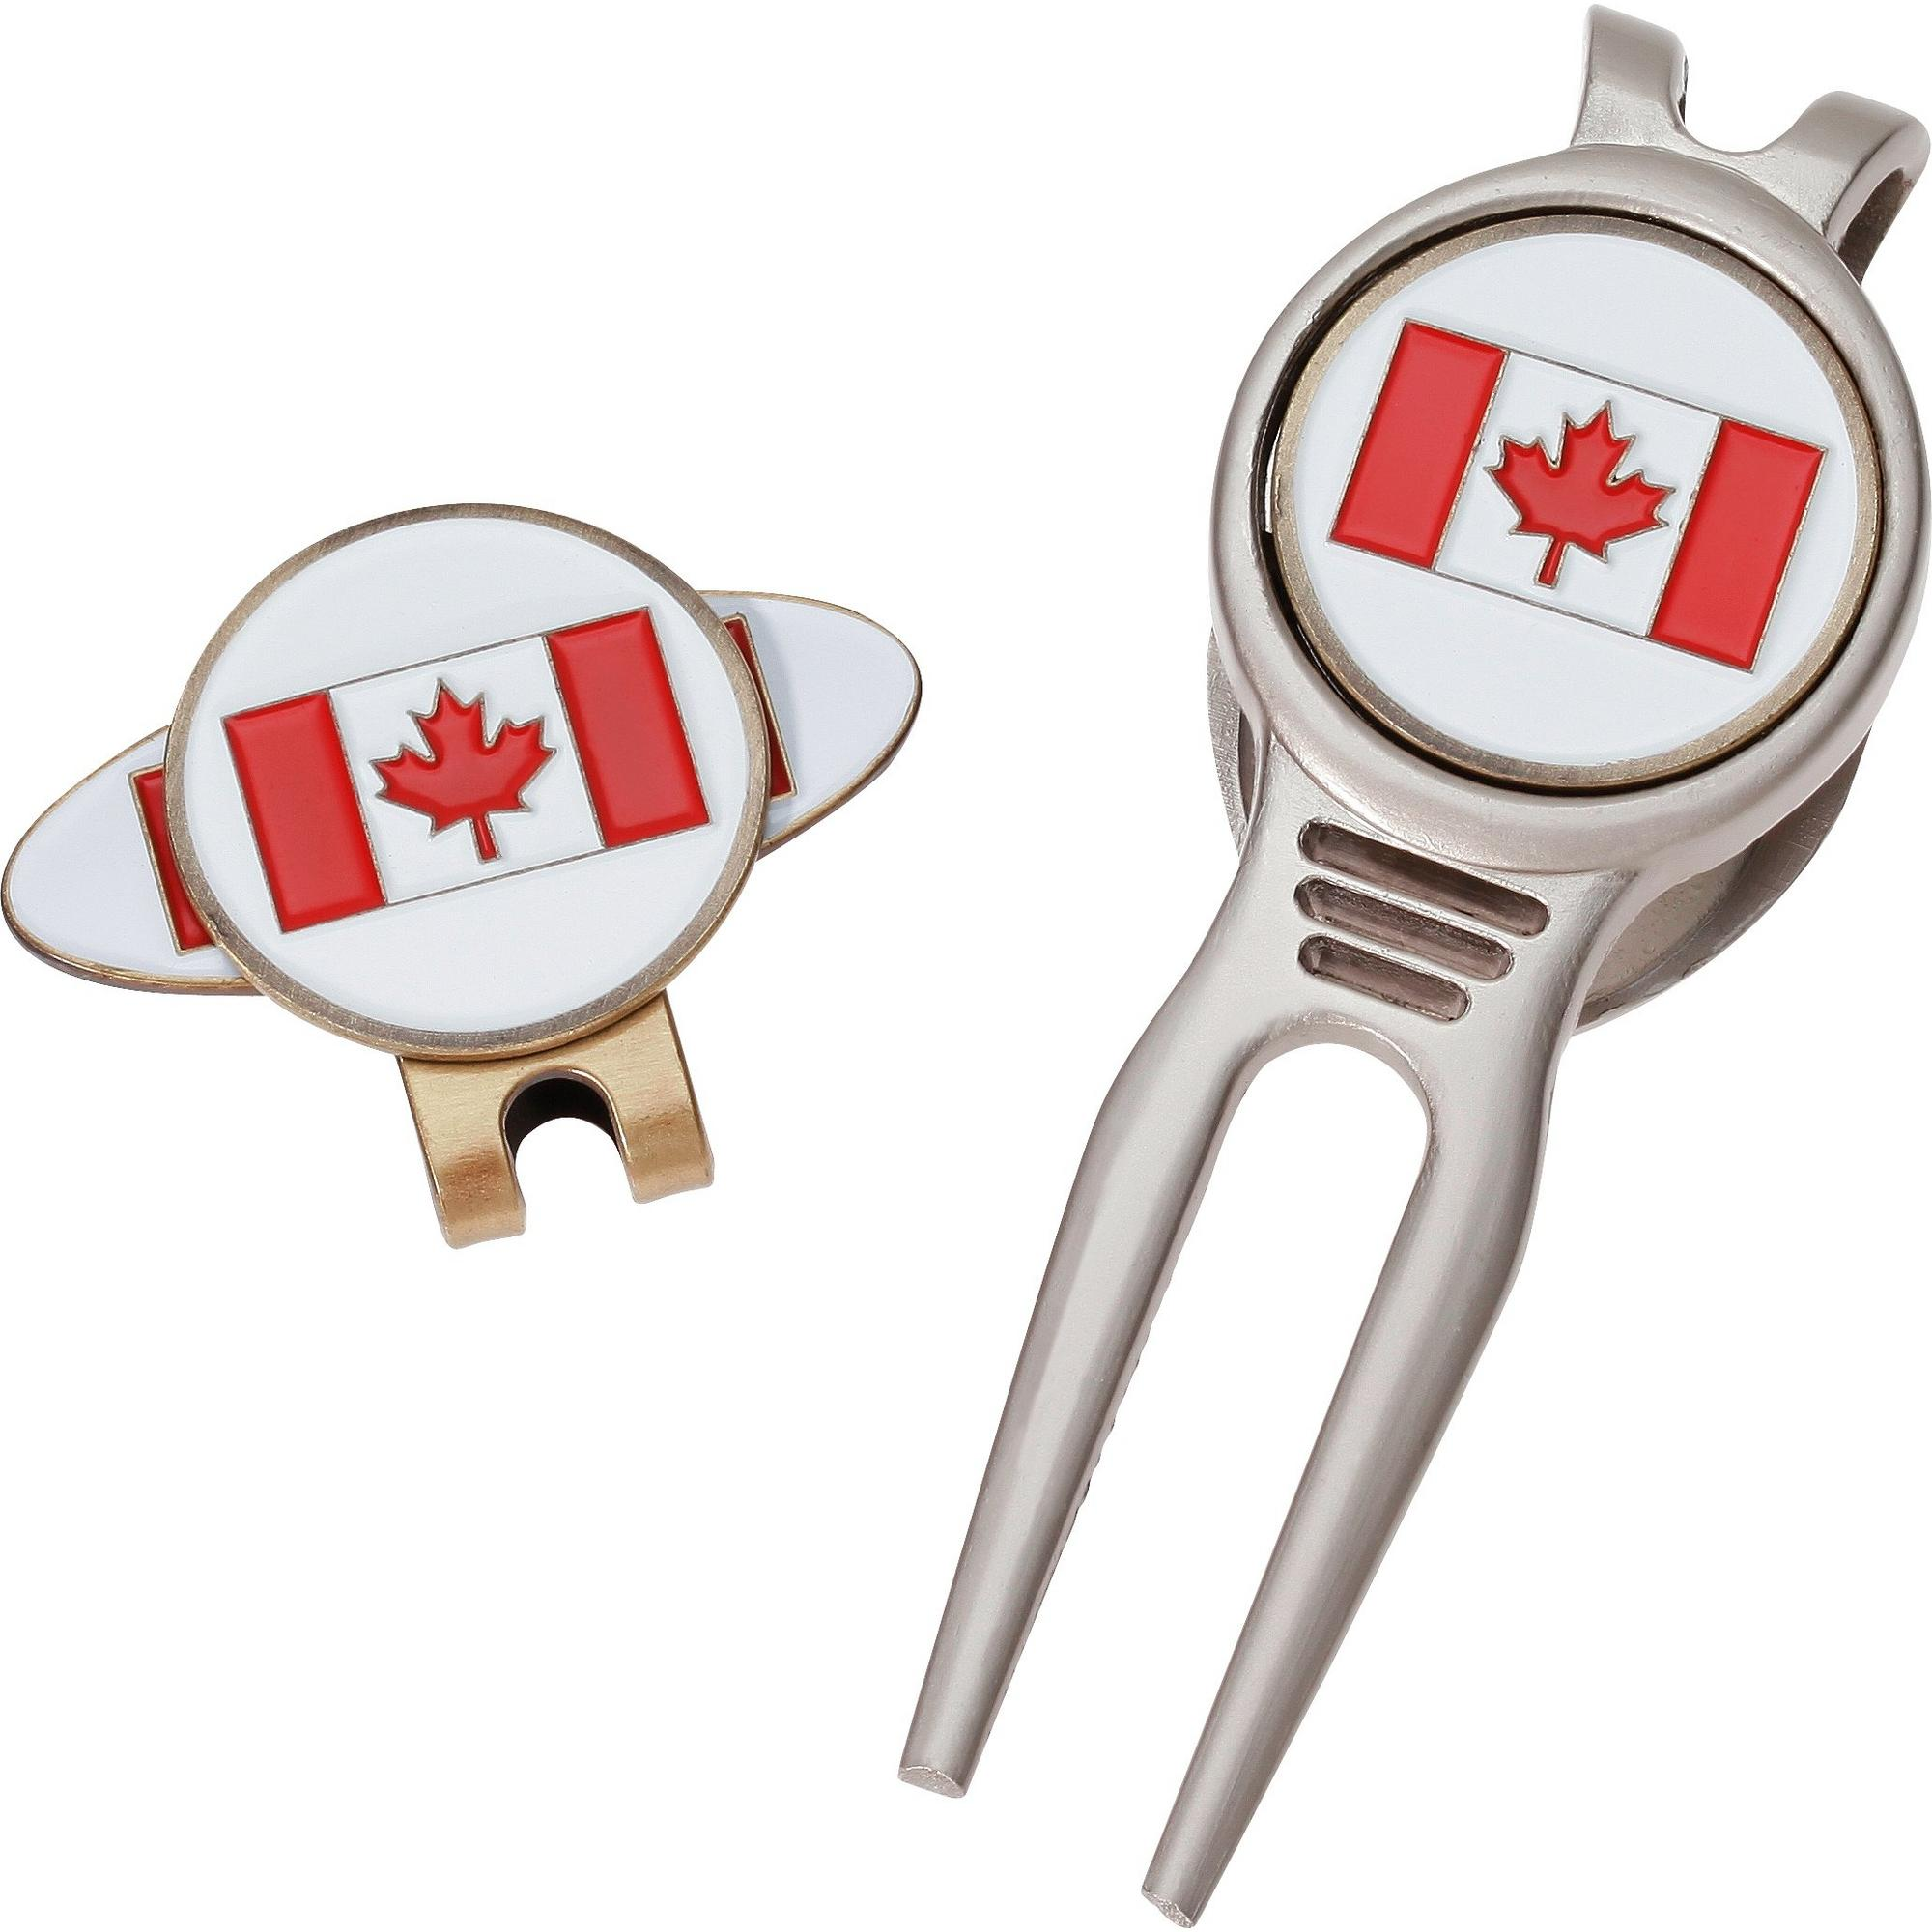 Canadian Flag Divot Tool Set